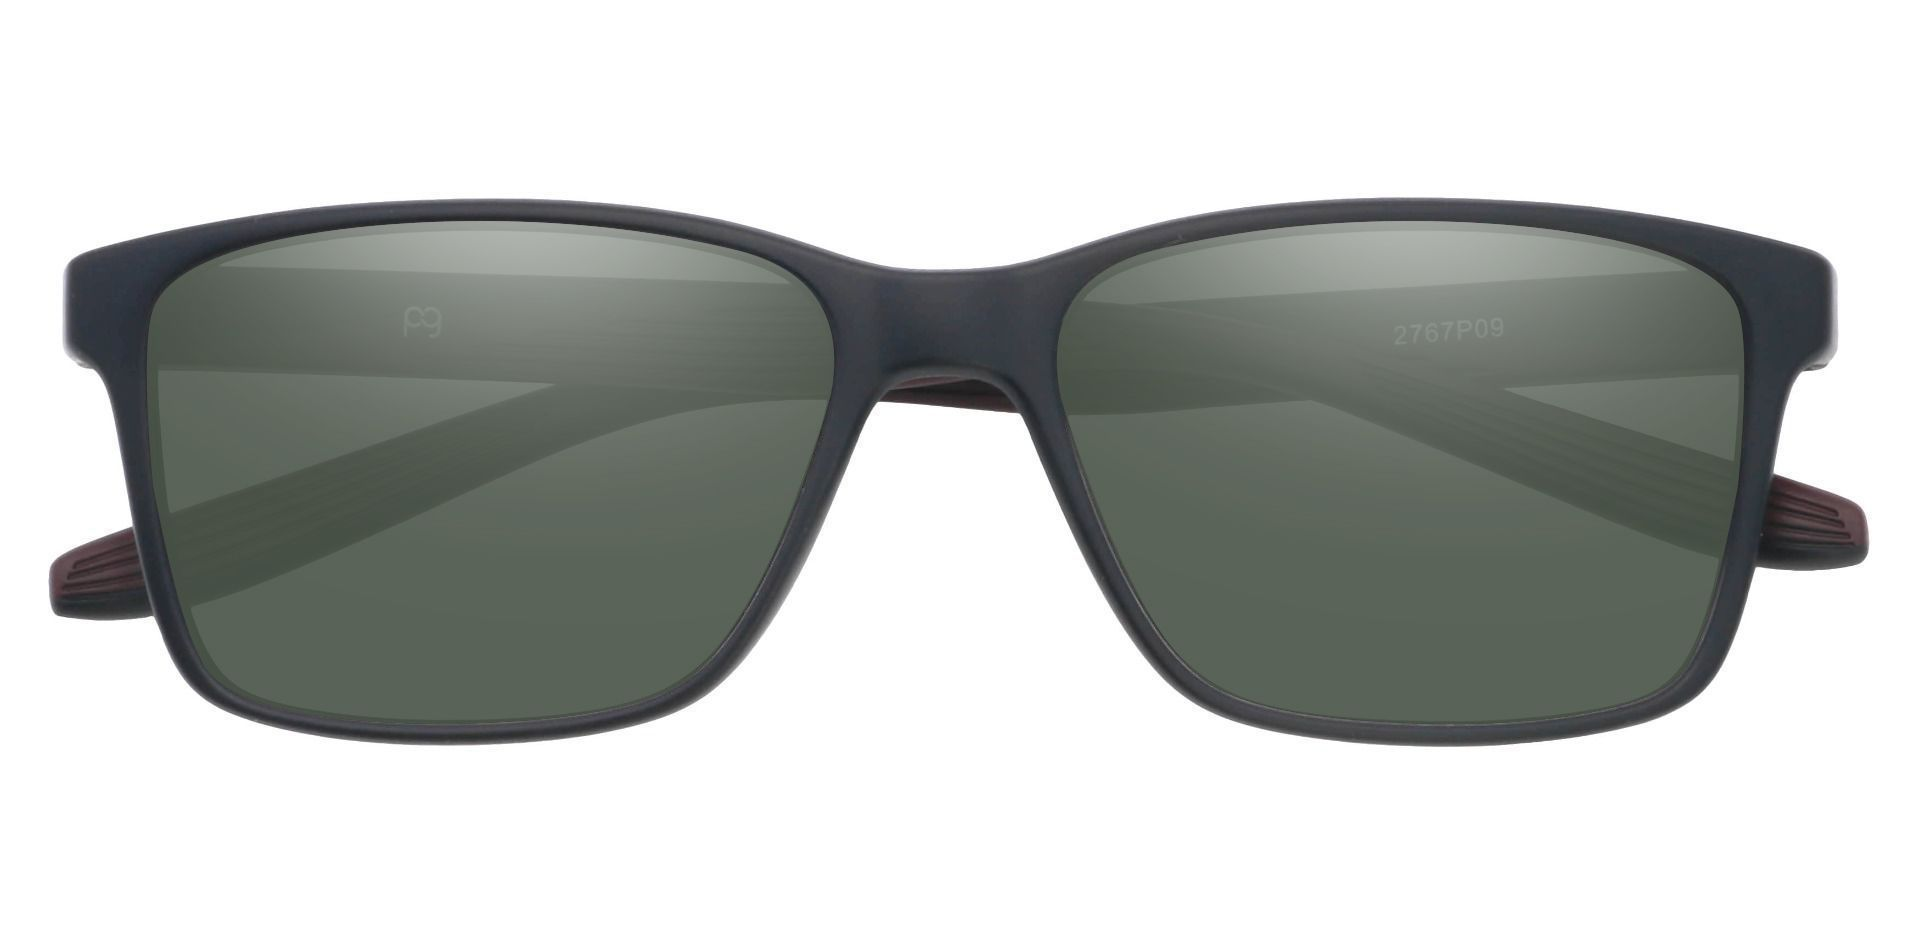 Berlin Rectangle Prescription Sunglasses - Brown Frame With Green Lenses